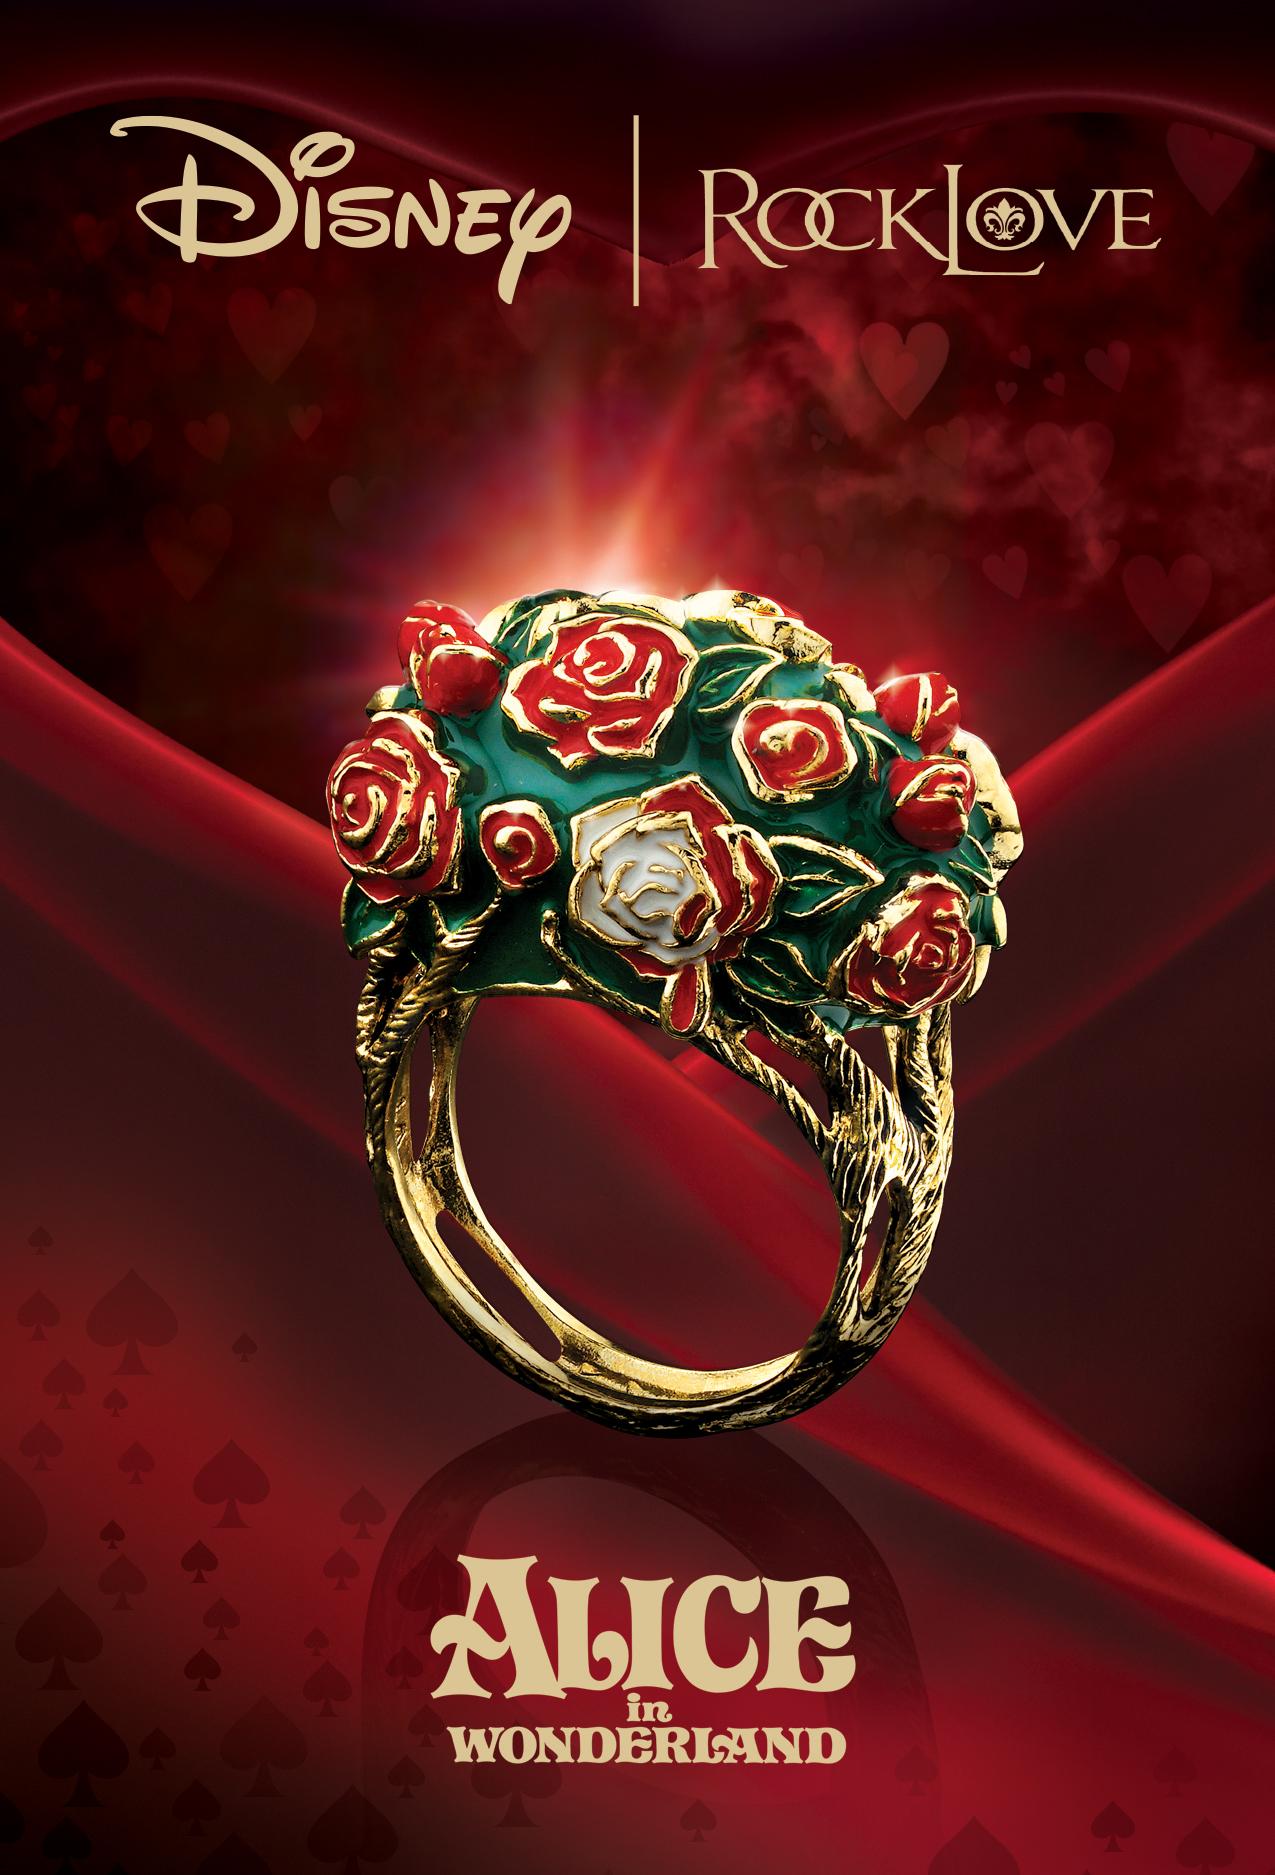 disney, alice in wonderland, beautiful, jewelry, ring, jewelry ad, red, print ad, creative jewelry ad